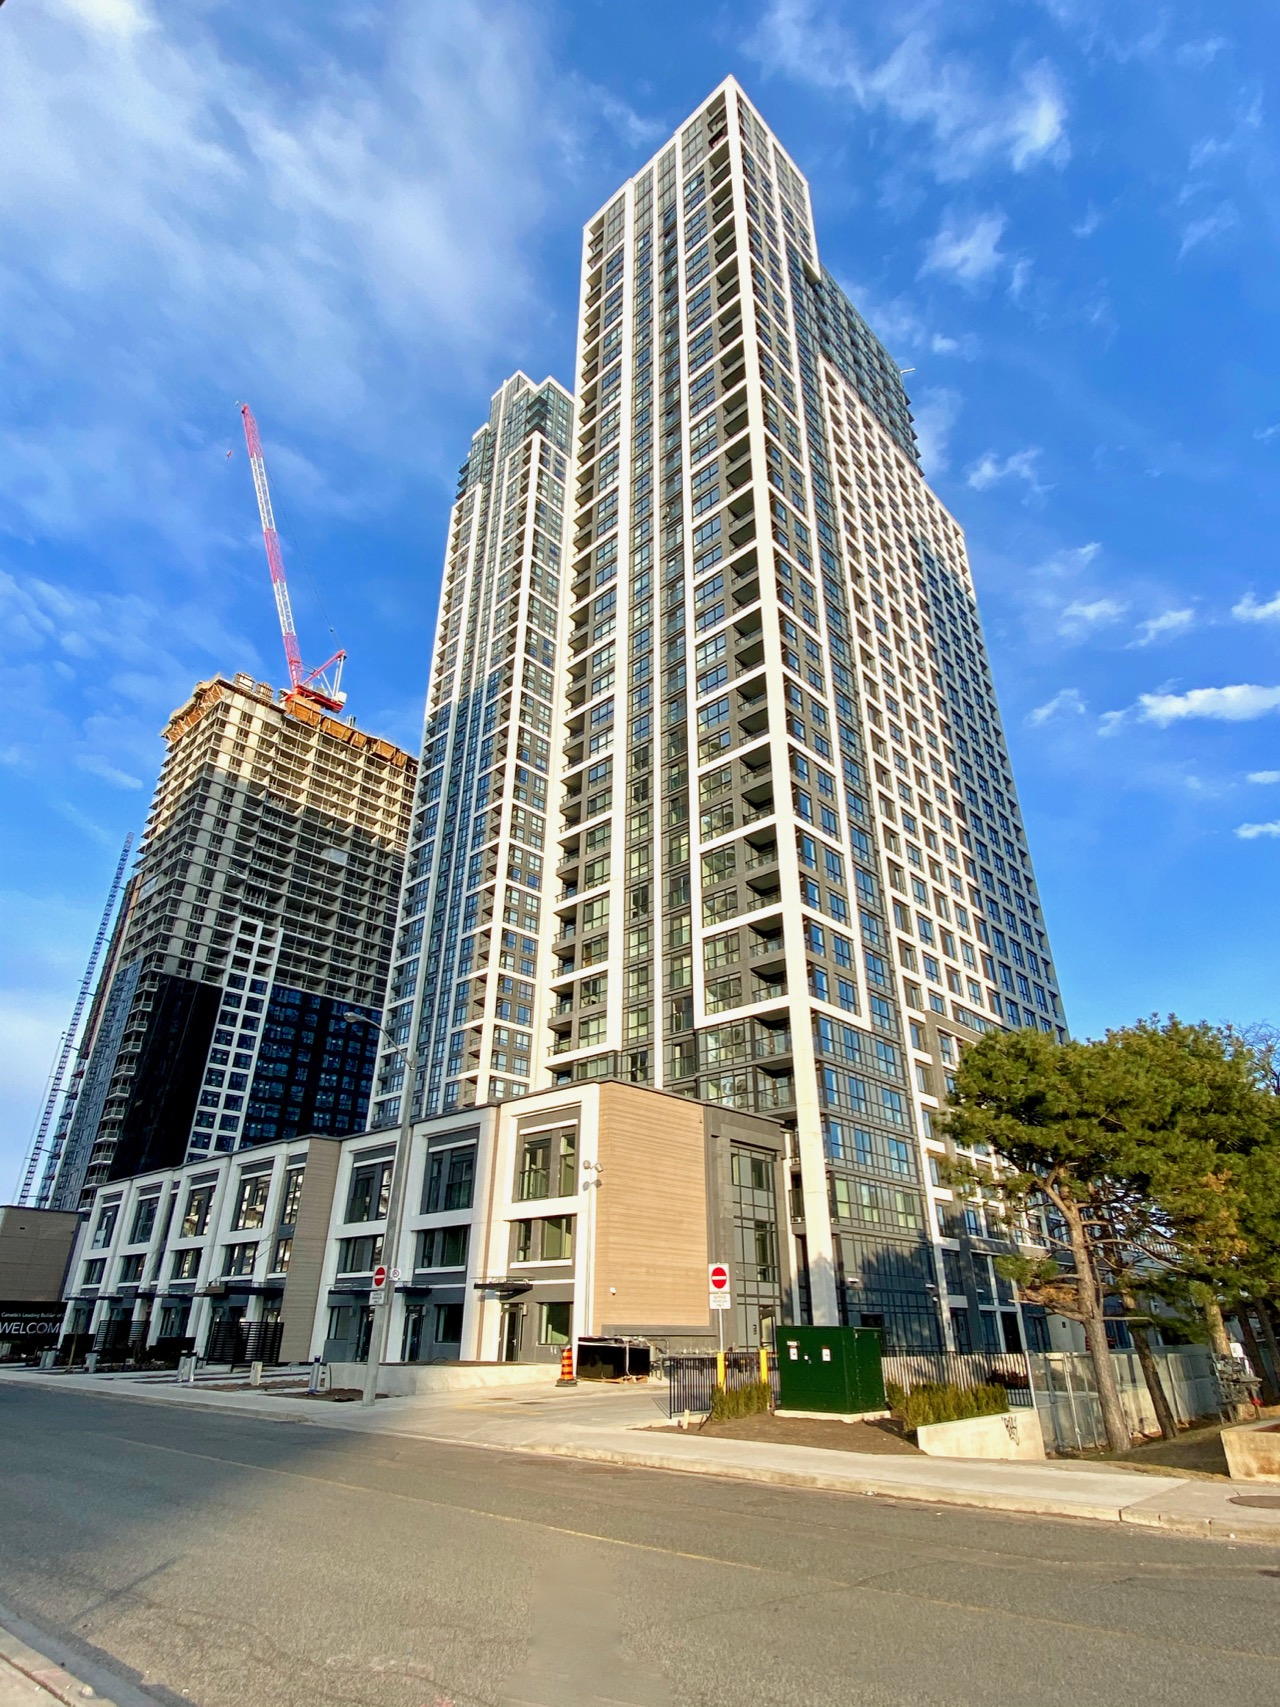 Islington Terrace, Tridel, Bloorvista, Bloor Promenade, Kirkor Architects, Toronto